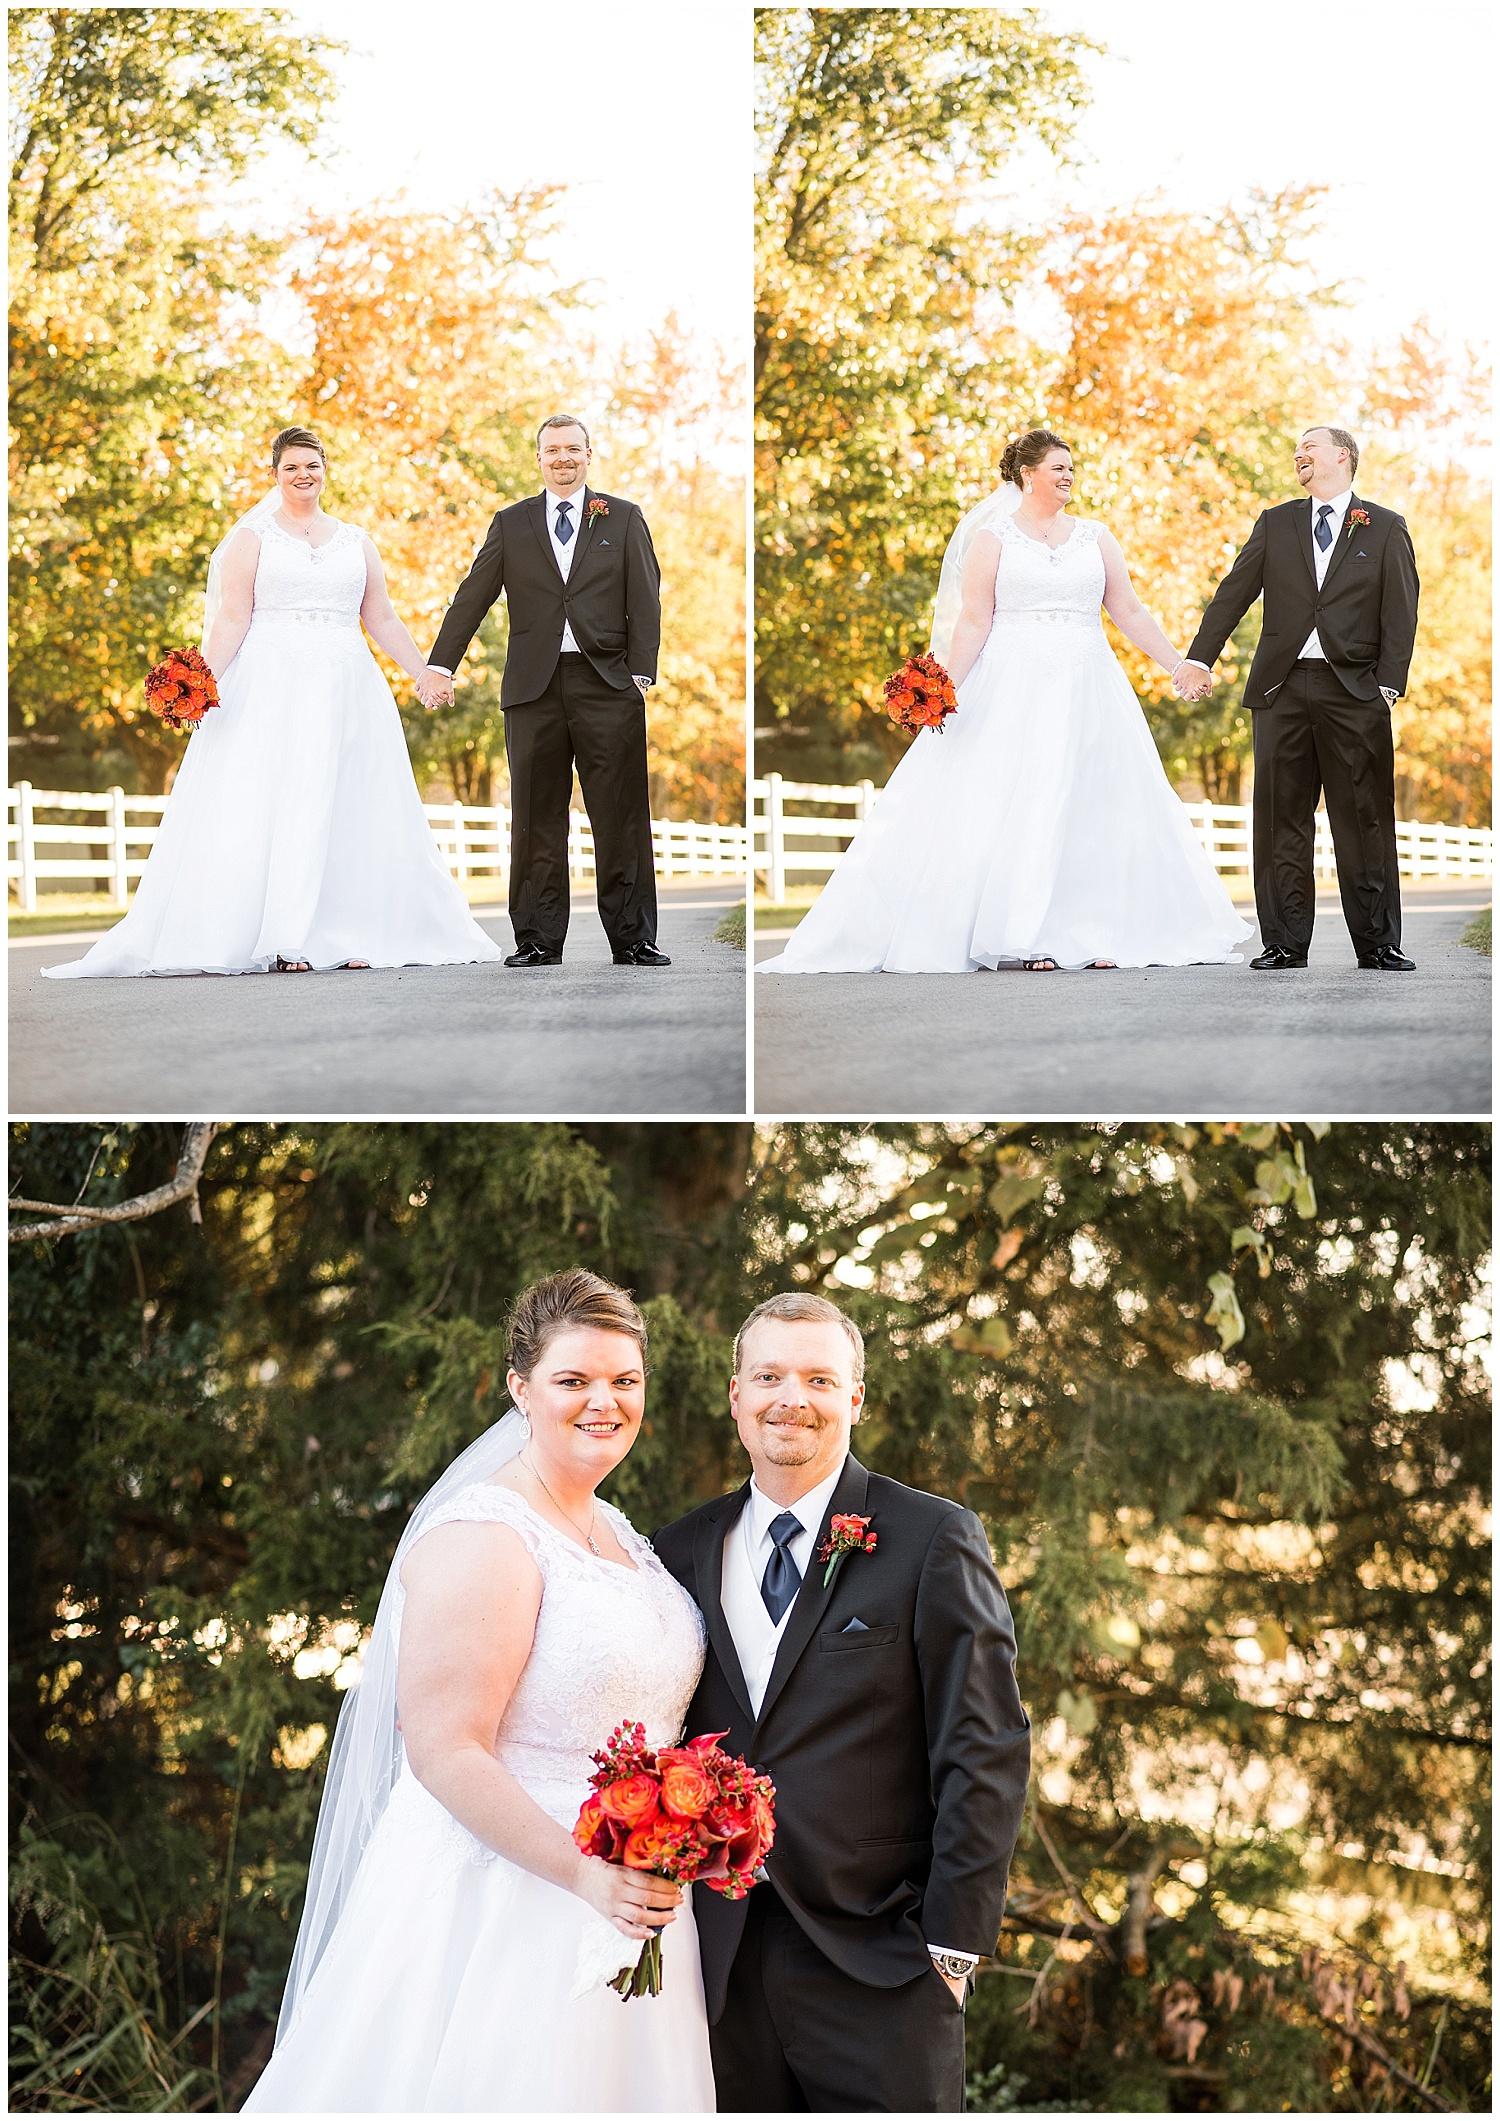 tiffany_daniel_wedding-3747.jpg